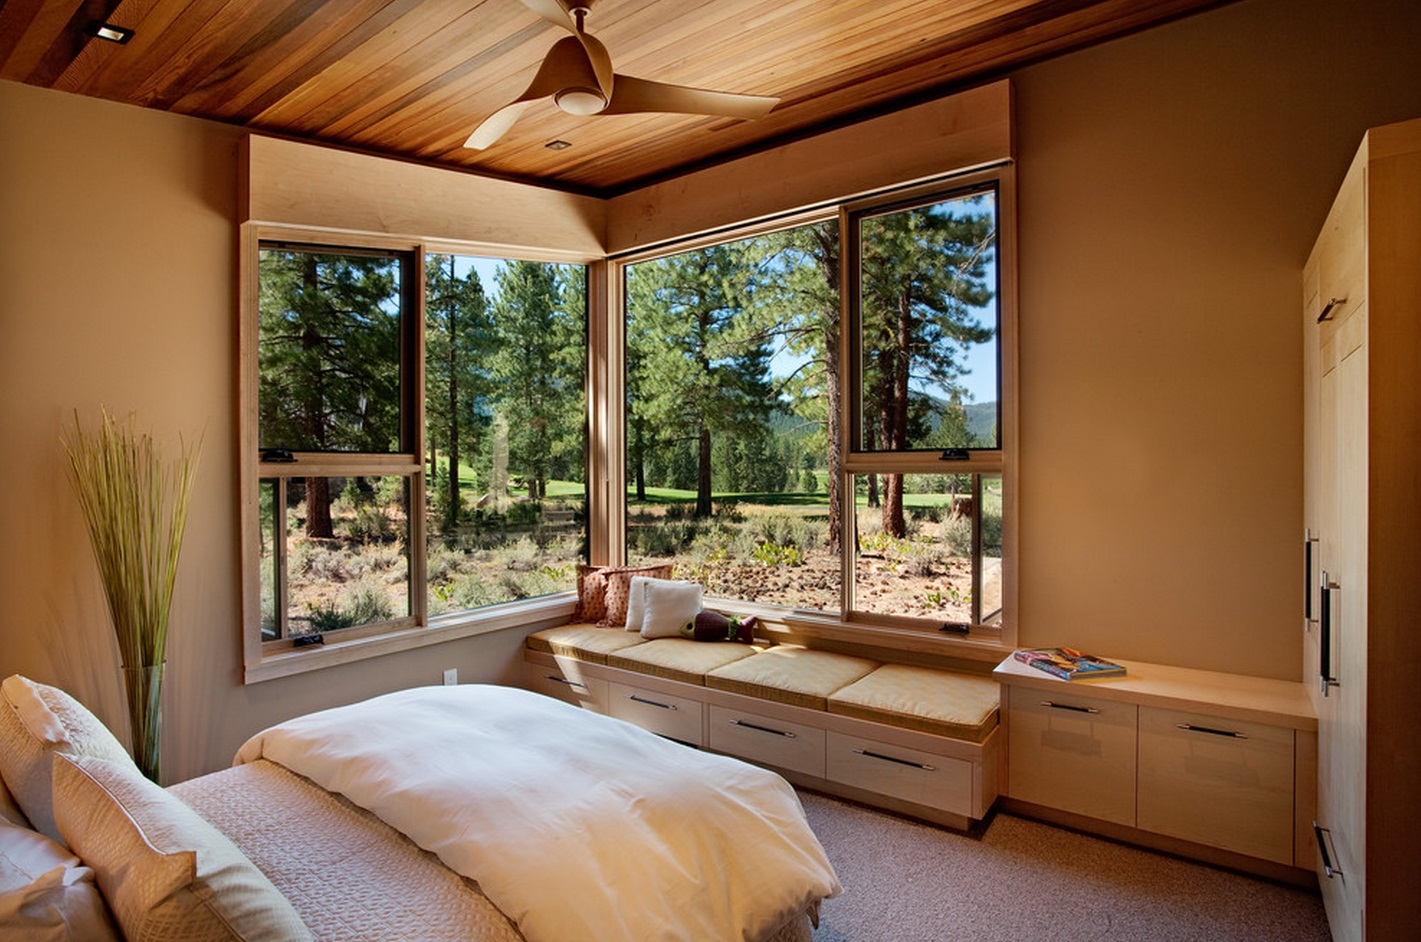 угловые панорамные окна